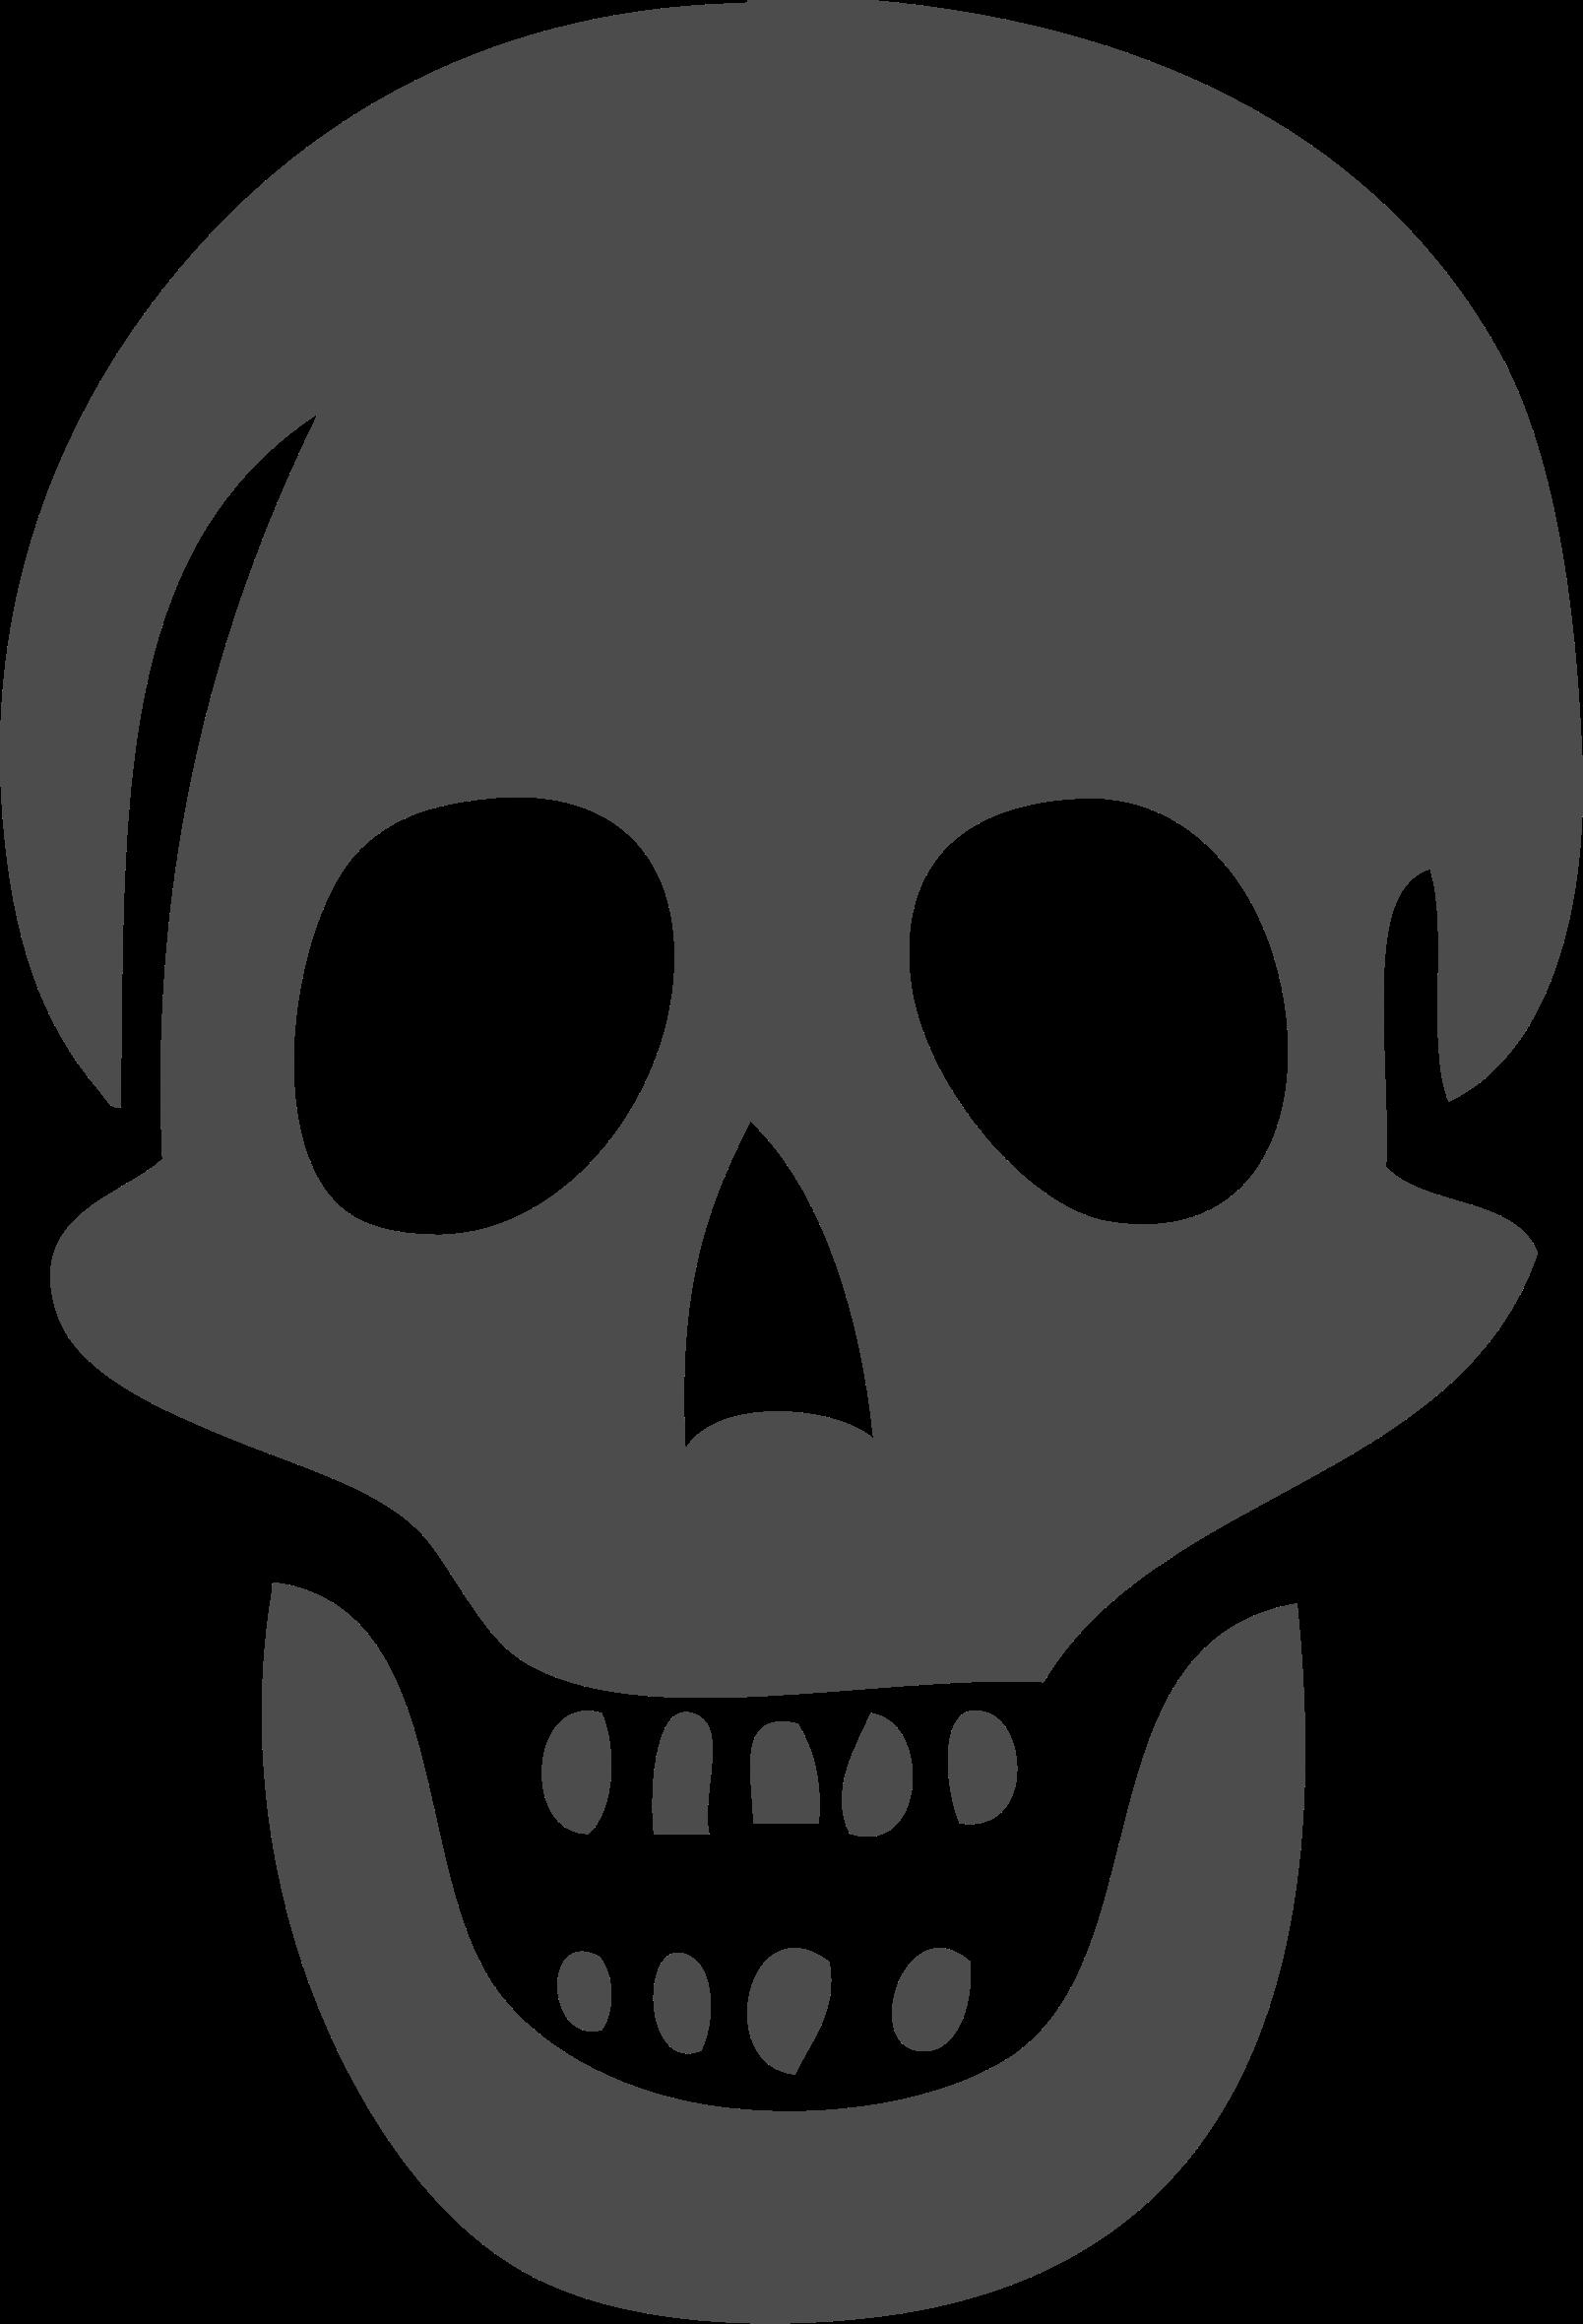 Ssckull clipart basic Pirate Pirate Skull (Remastered) (Remastered)